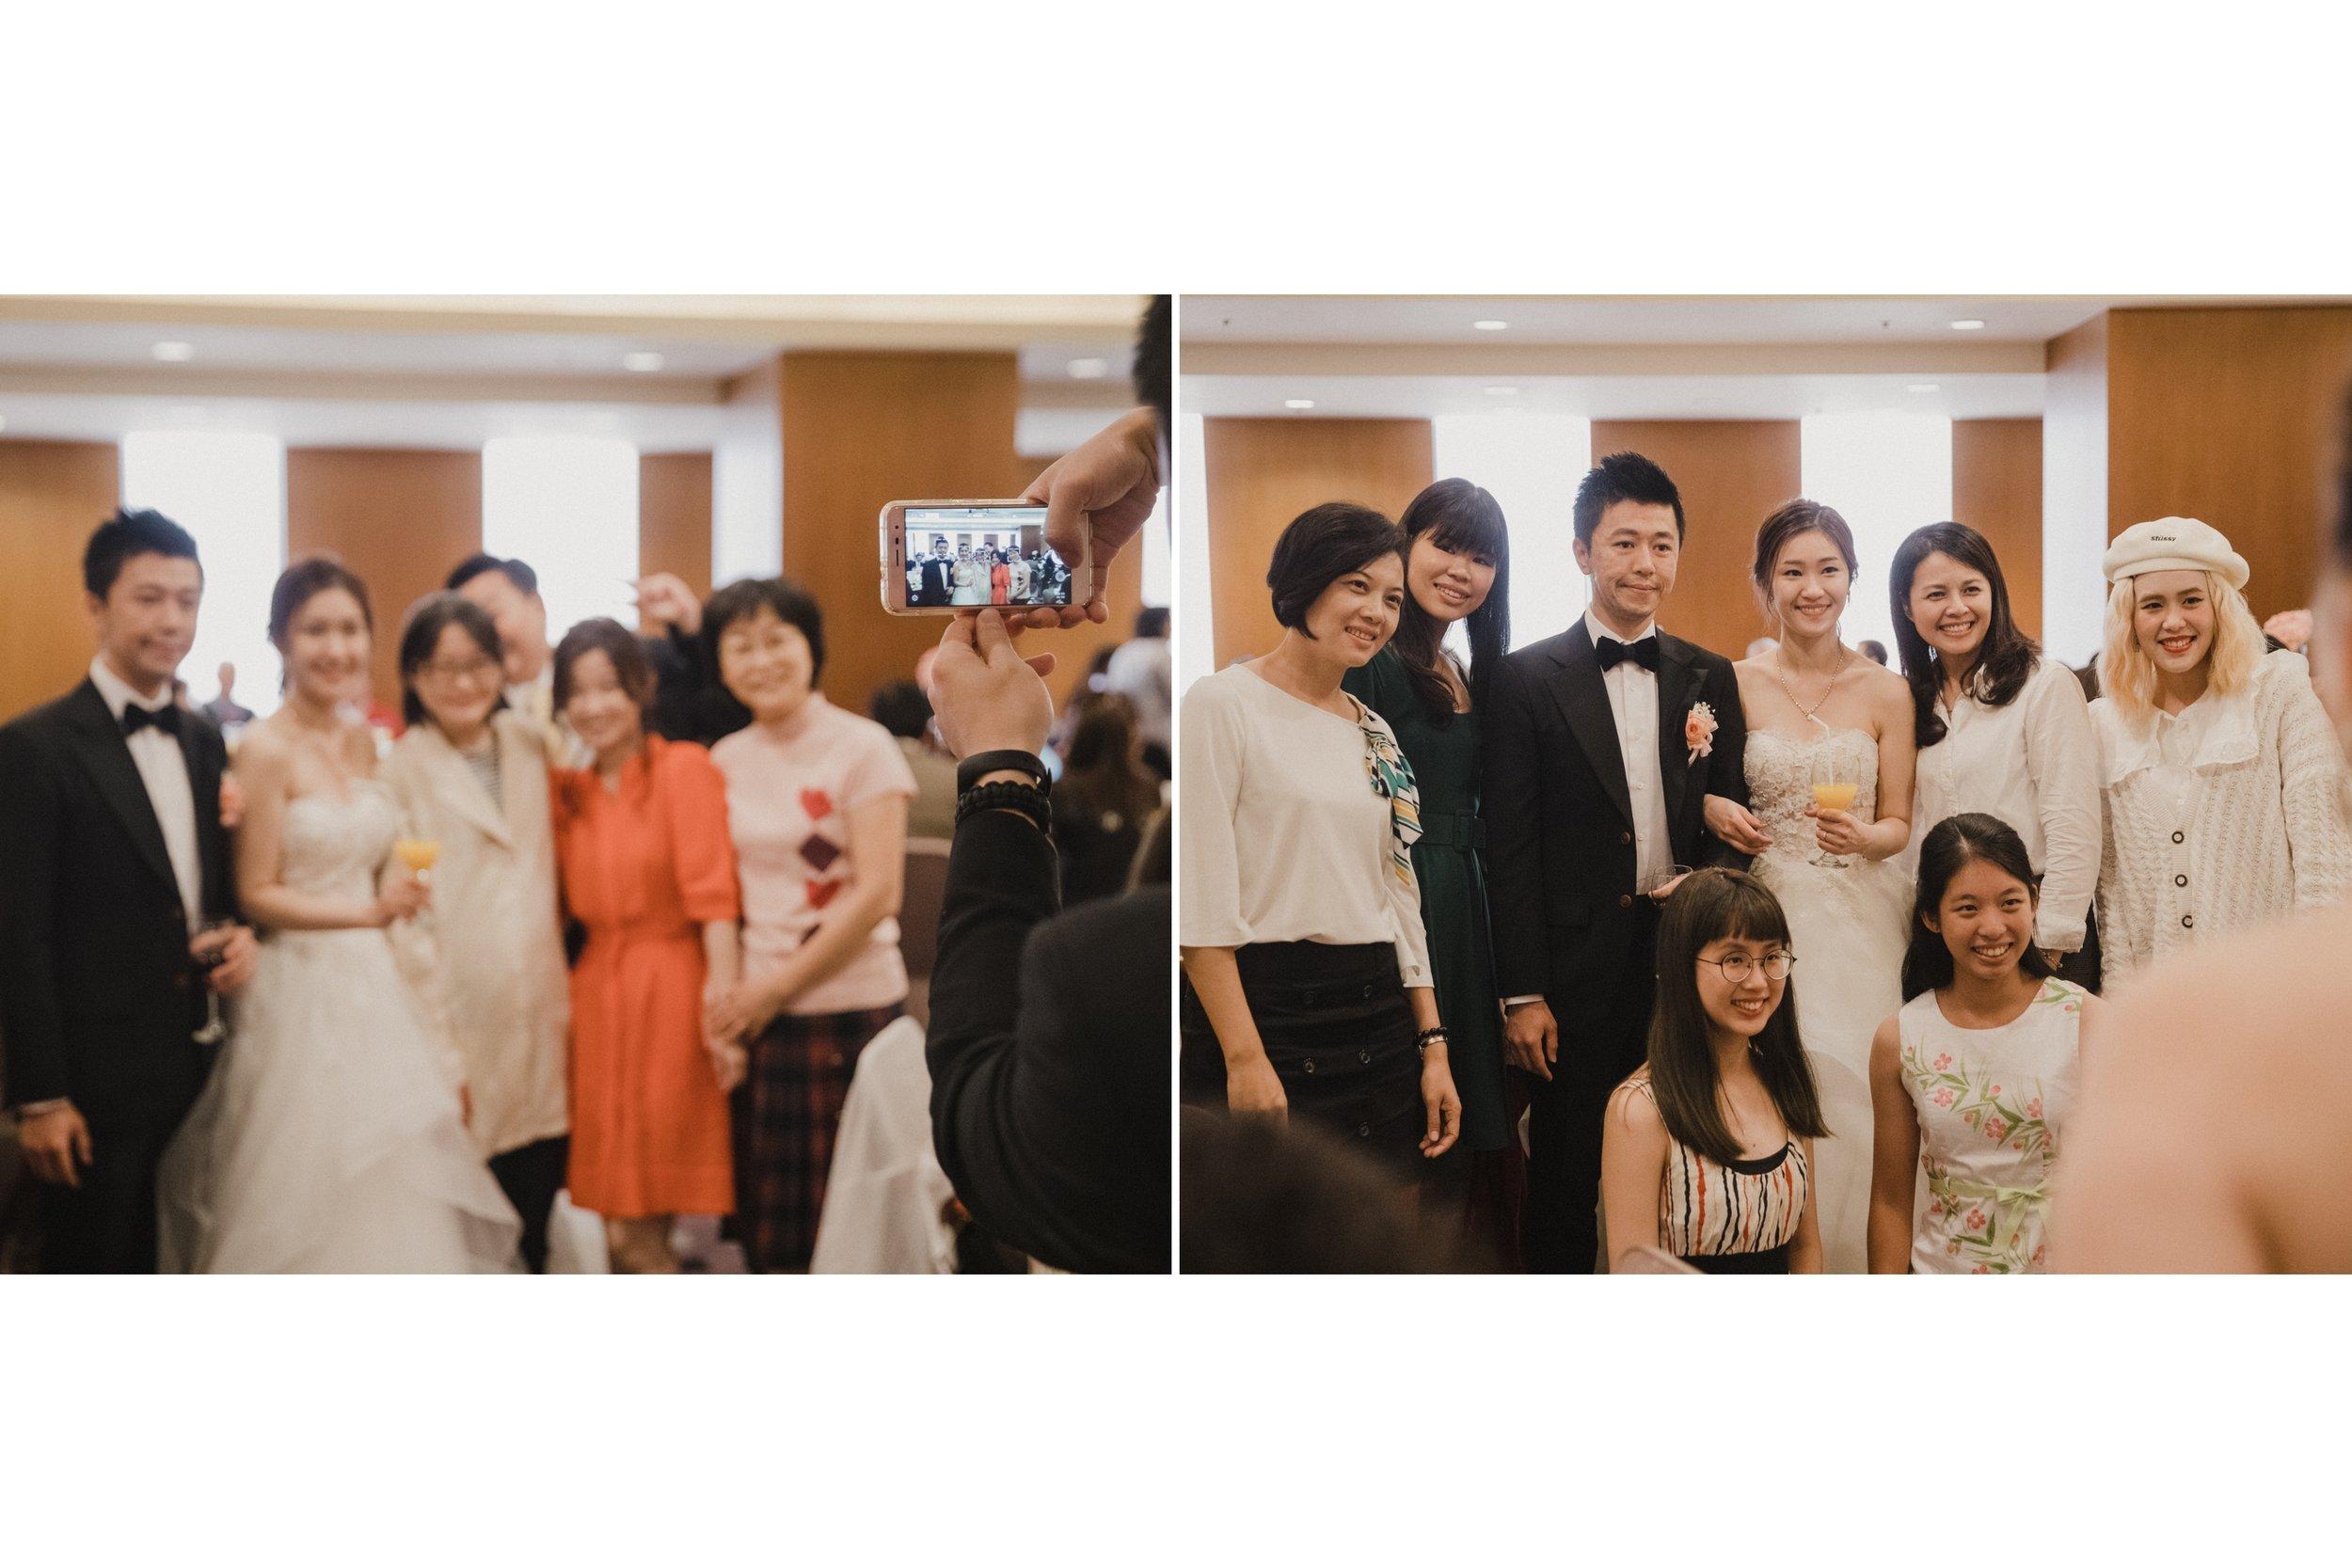 wedding-caridee-oscar-lunch-ambassador-hsinchu-結婚午宴-新竹國賓_140.jpg